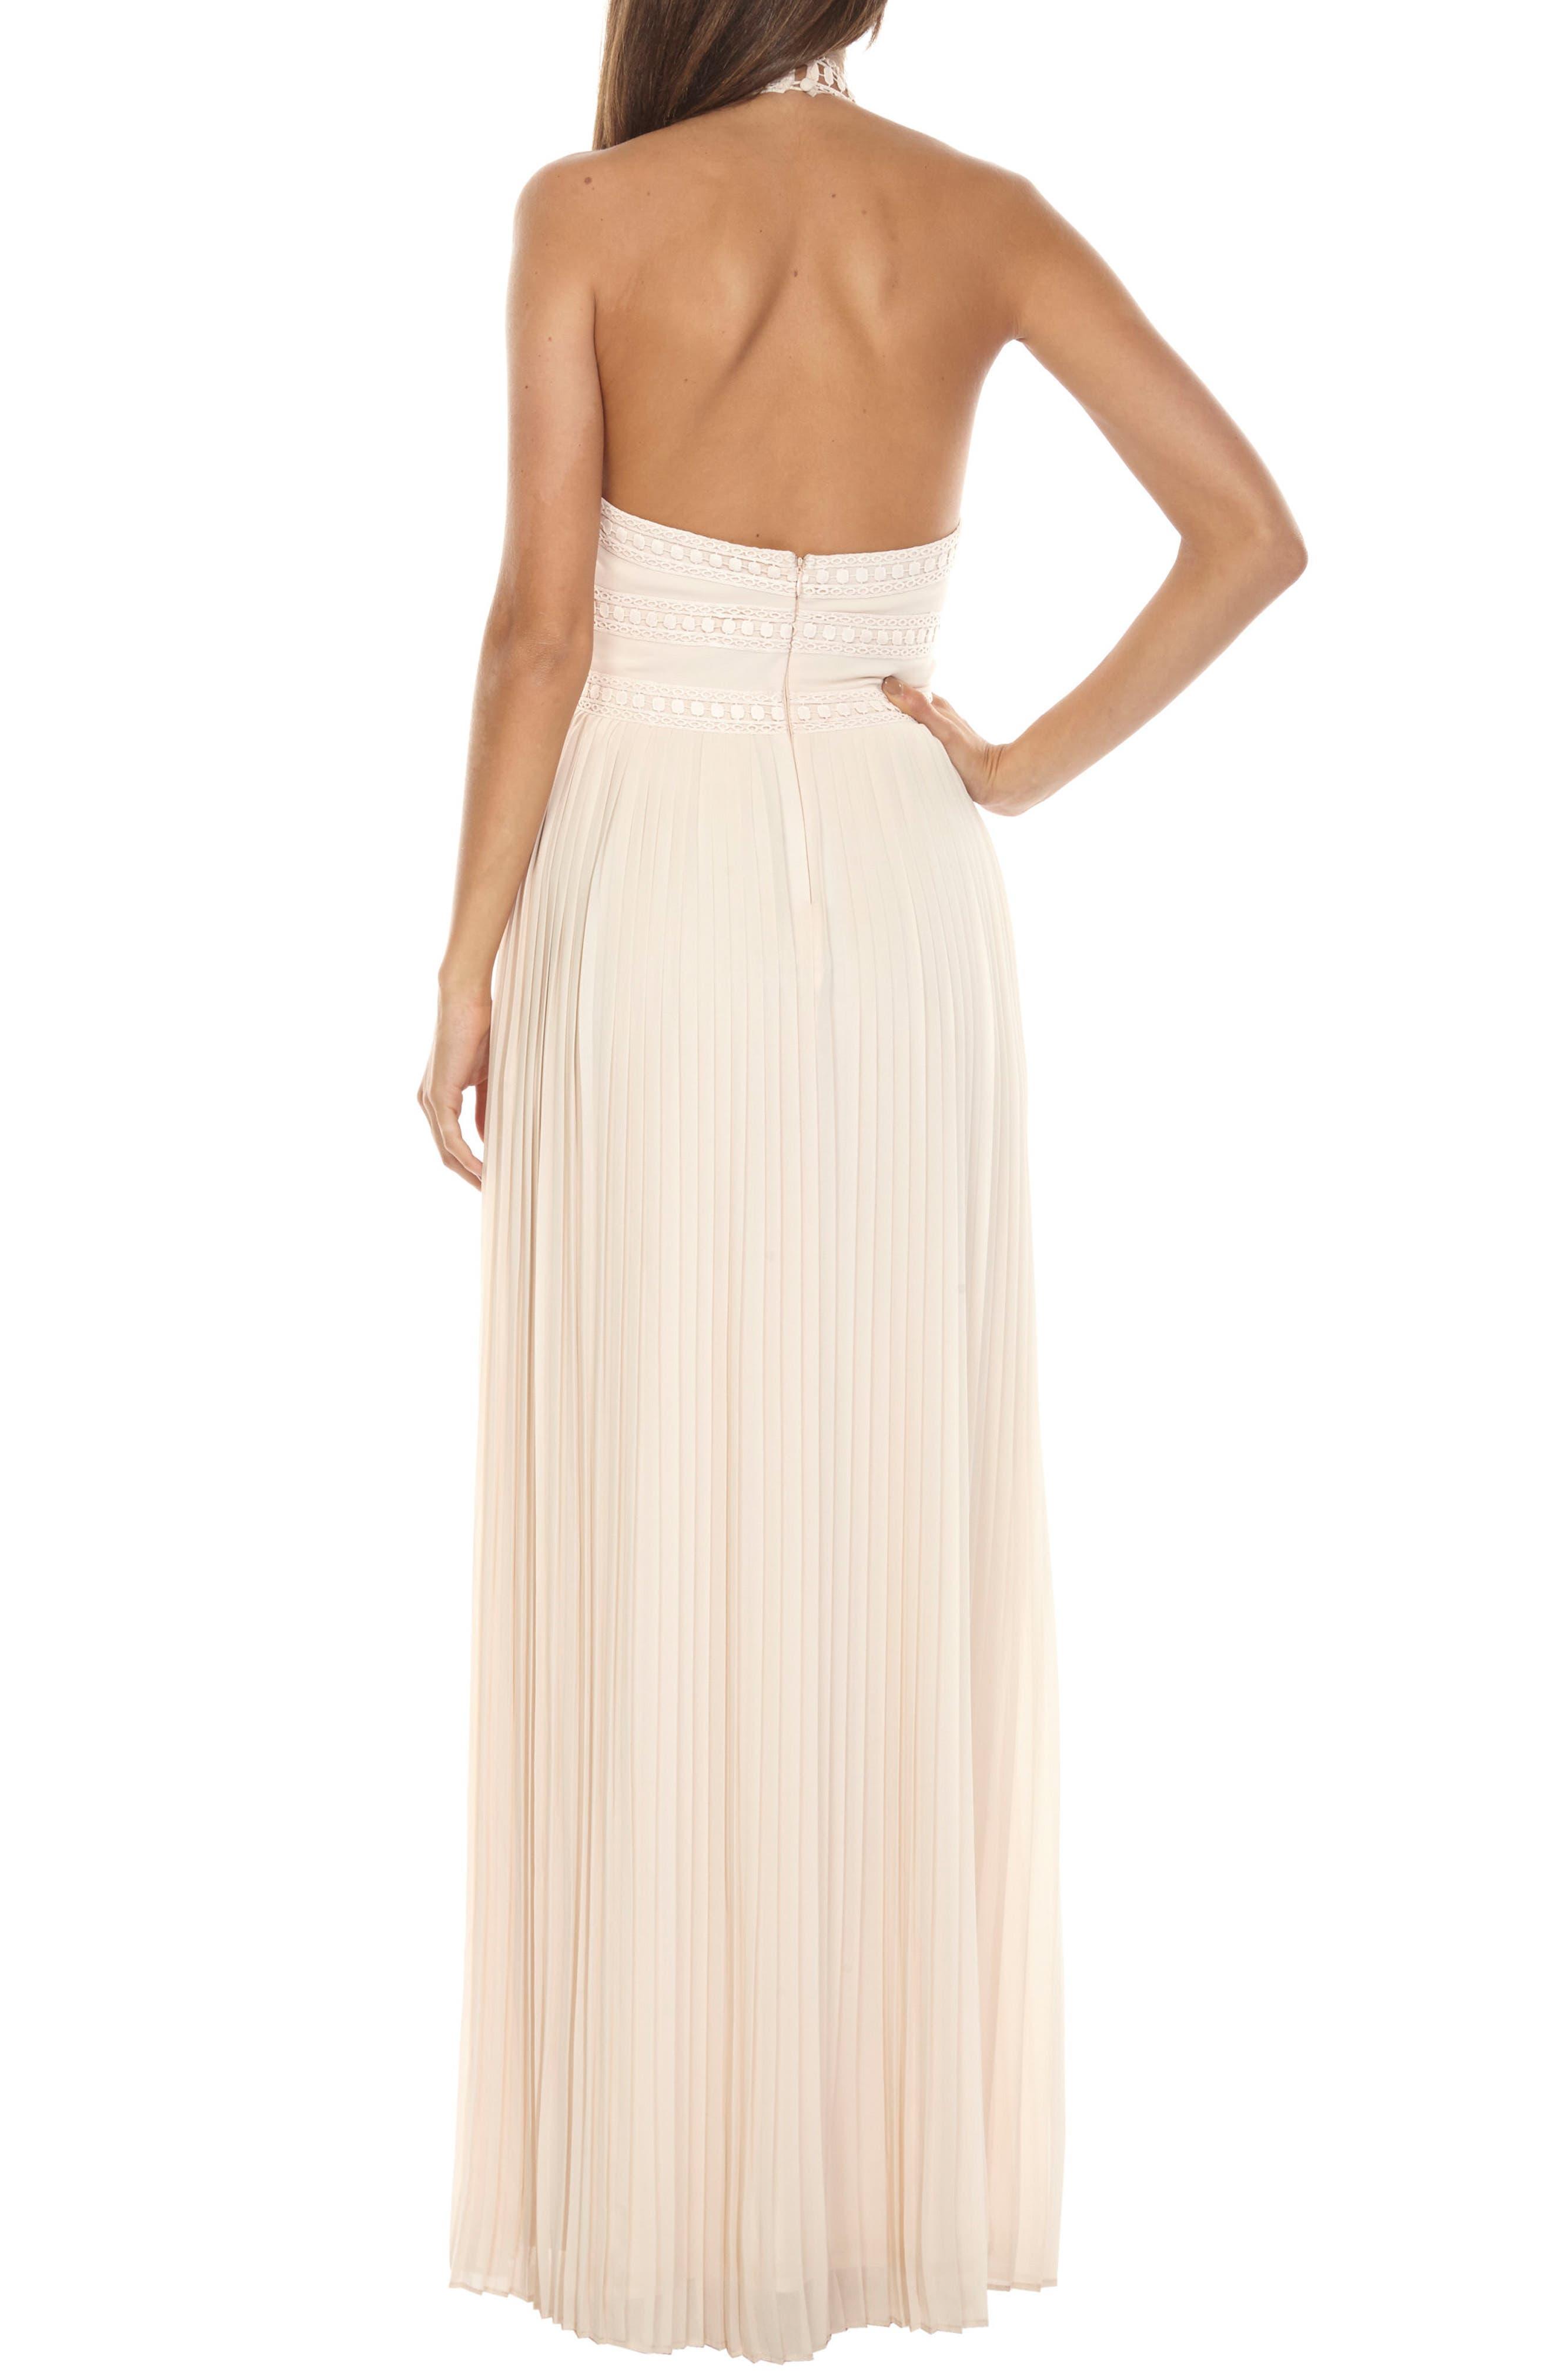 Corinne Lace Trim Halter Maxi Dress,                             Alternate thumbnail 2, color,                             Nude